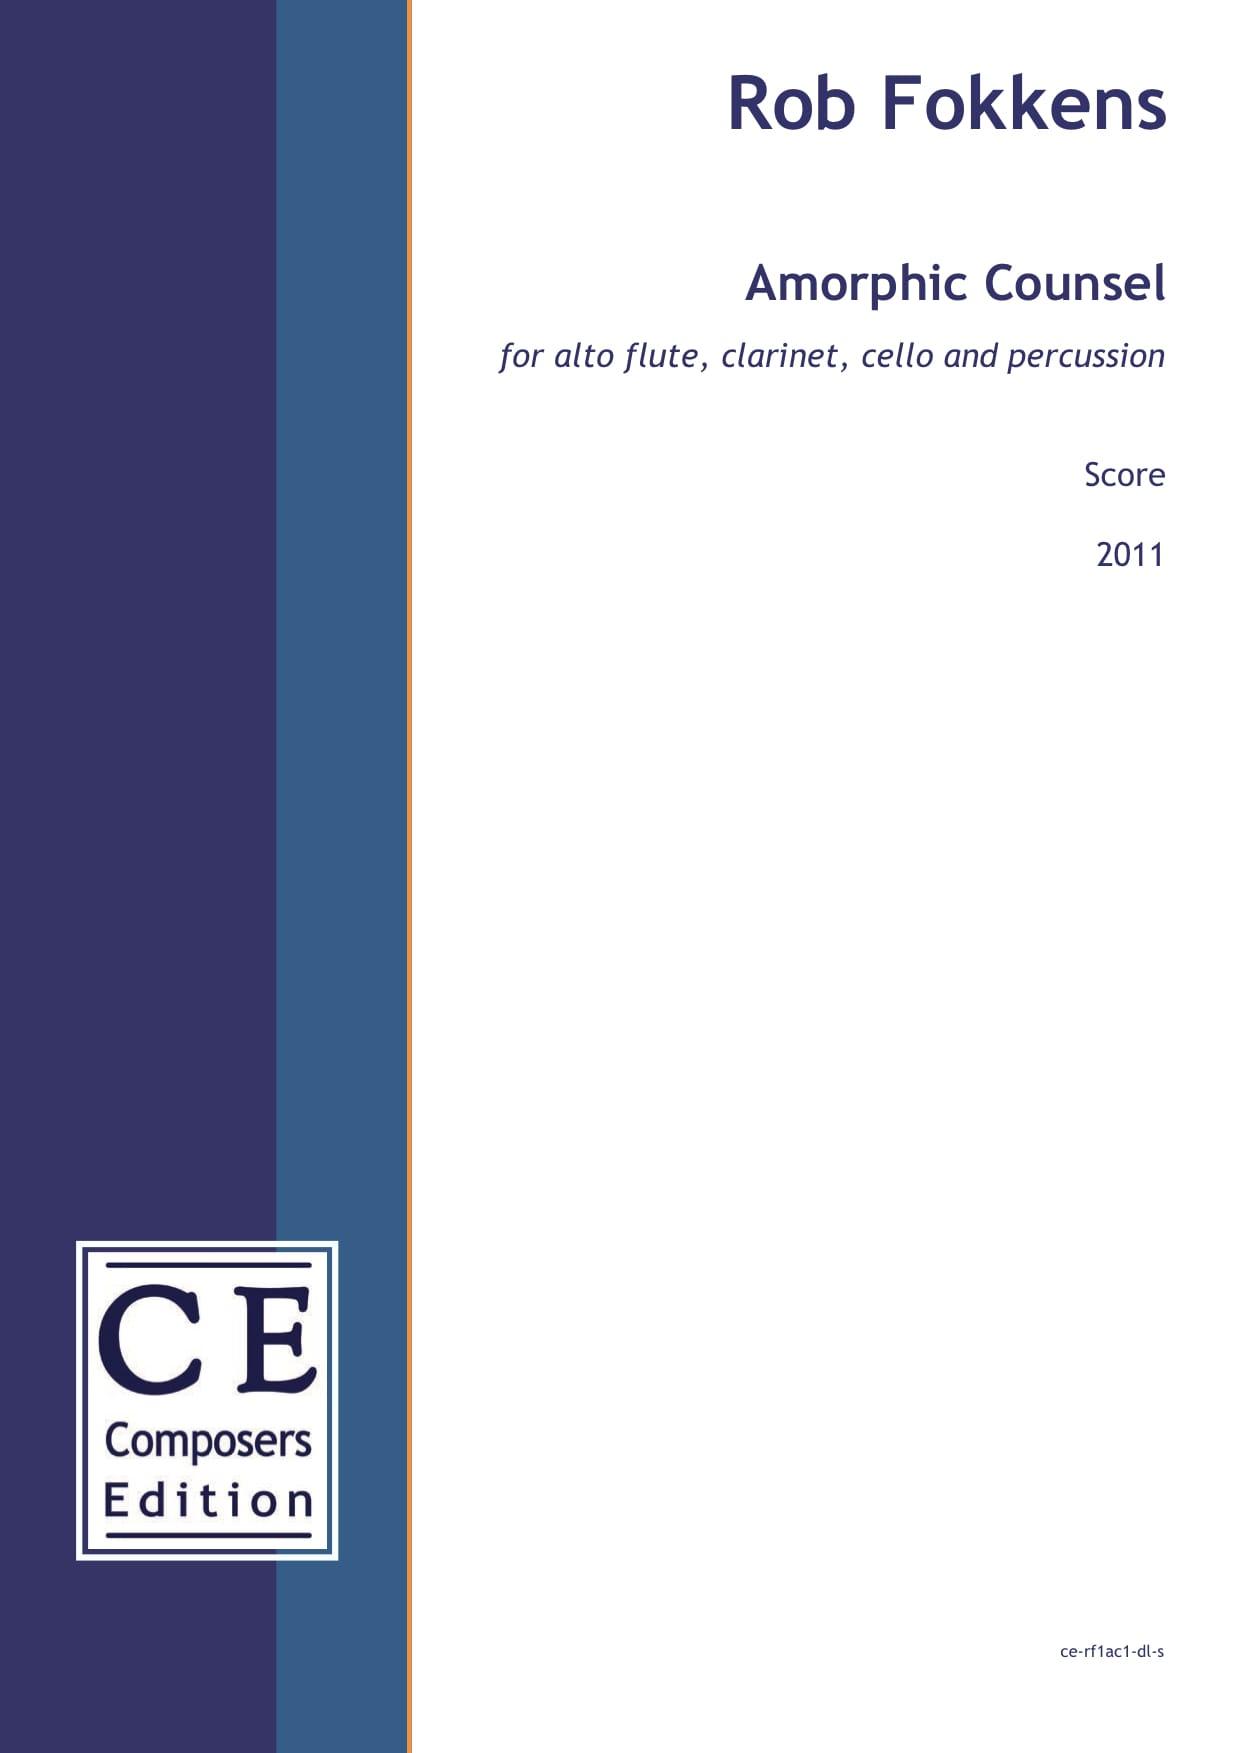 Rob Fokkens: Amorphic Counsel for alto flute, clarinet, cello and percussion